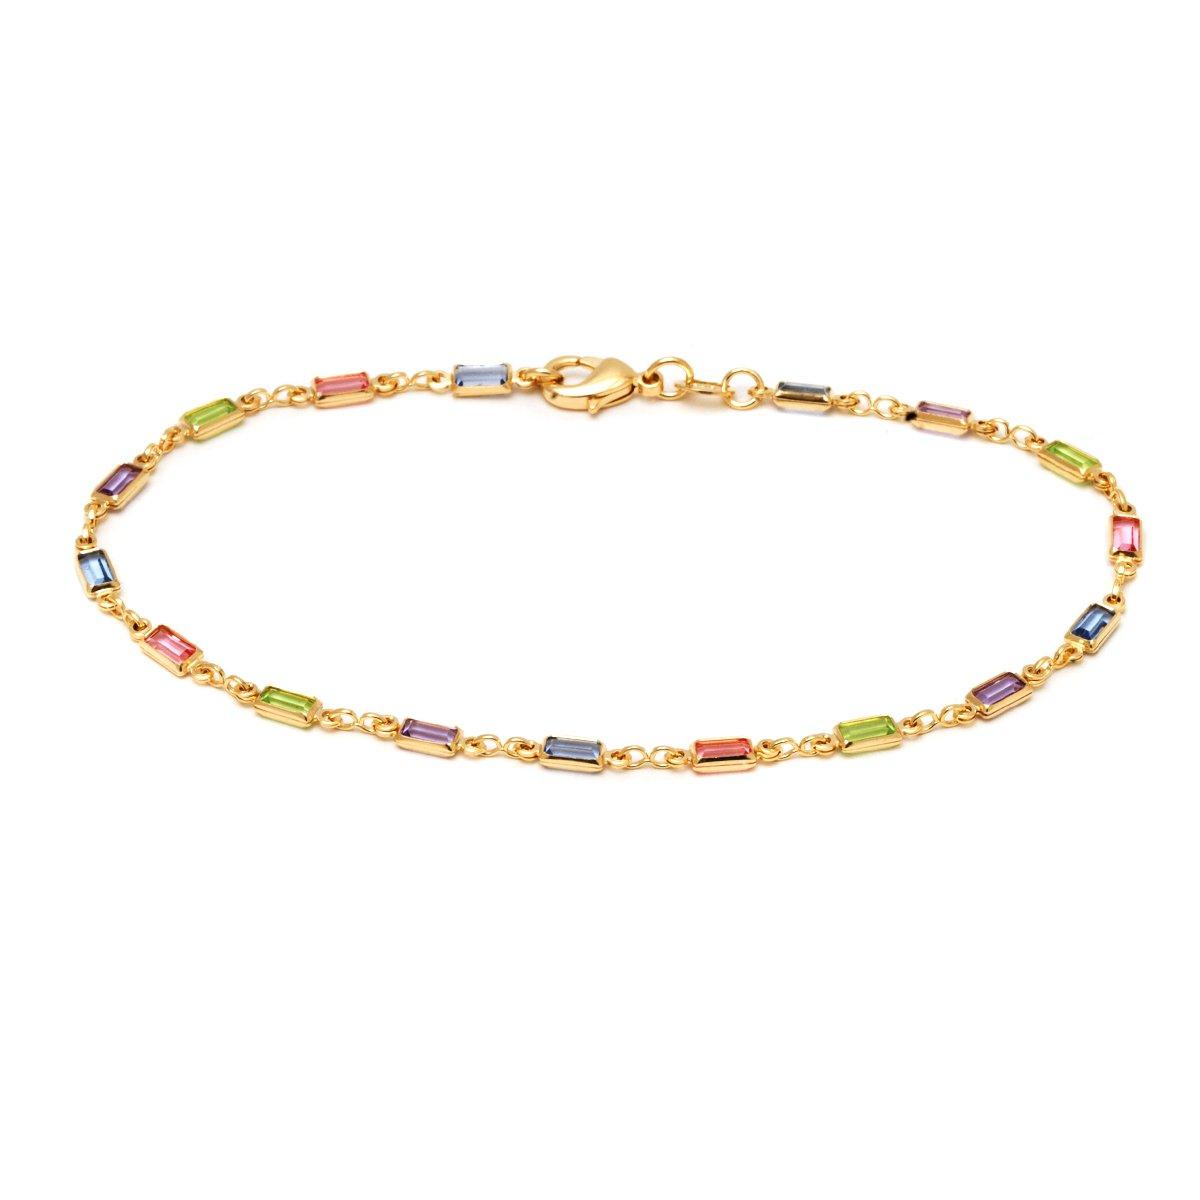 18K Gold Plated Gold and Multi Color Crystal Baguette Anklet SGS INTERNATIONAL BR199-10''